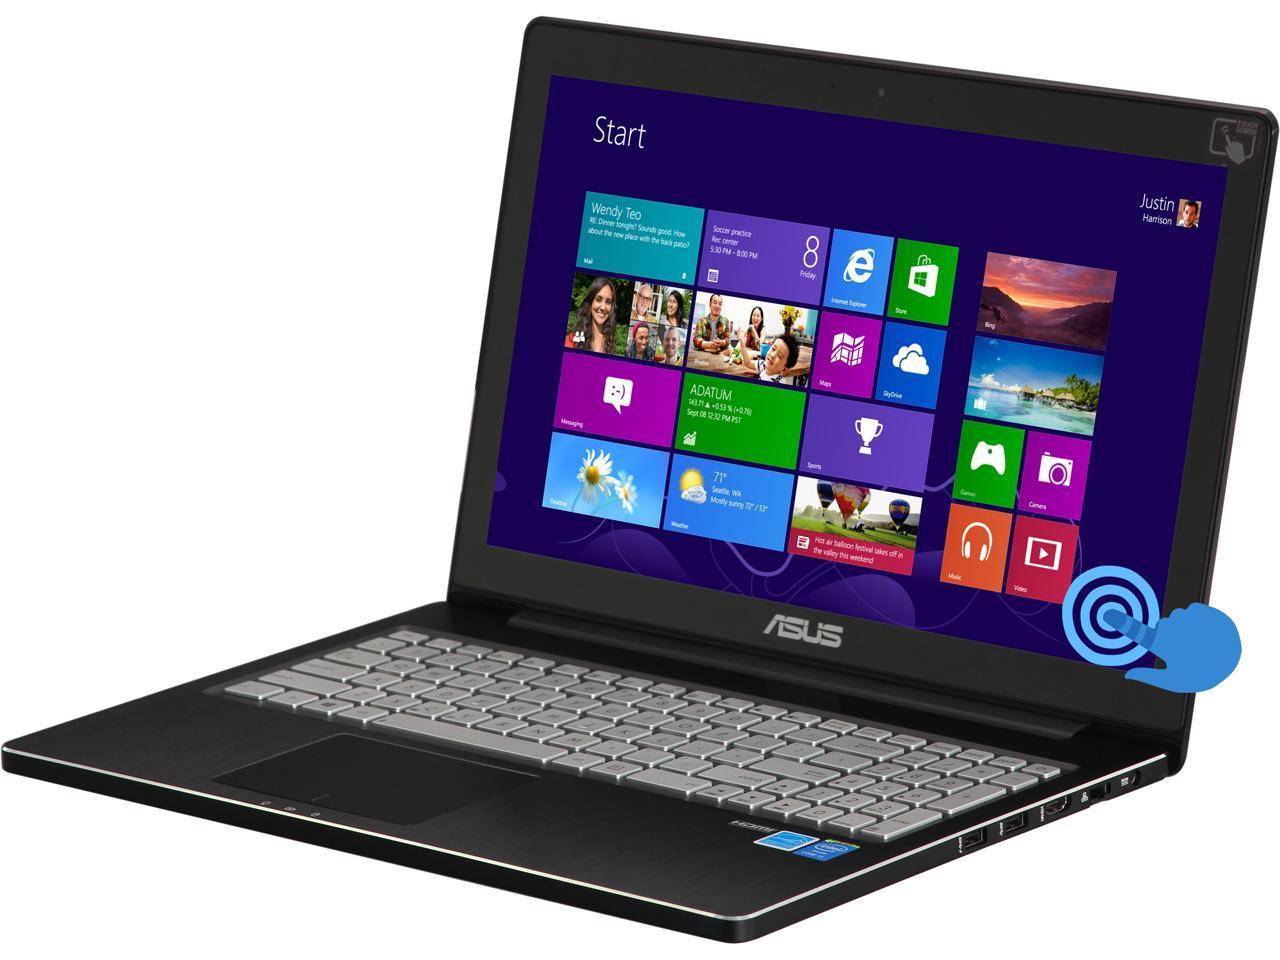 Refurbished Asus Laptop Q501la Bbi5t03 Intel Core I5 4th Gen 4200u 1 60 Ghz 6 Gb Memory 750 Gb Hdd Intel Hd Graphics 4400 15 6 Touchscreen Windows 8 64 Bit Newegg Com